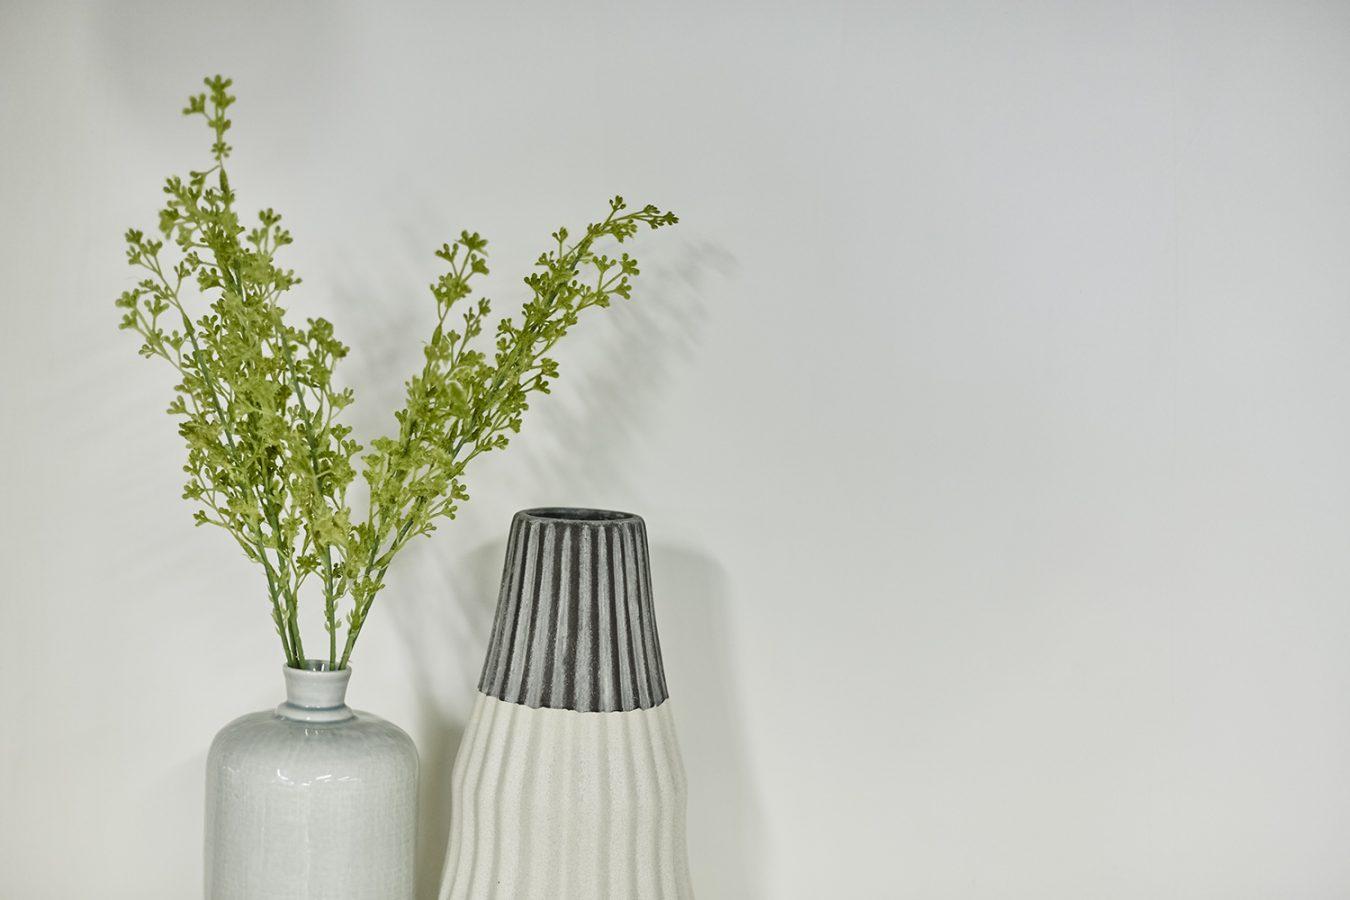 Good_Stuff_843_cool_workspace_office_design_interiors_graphic_london_flowers_vase